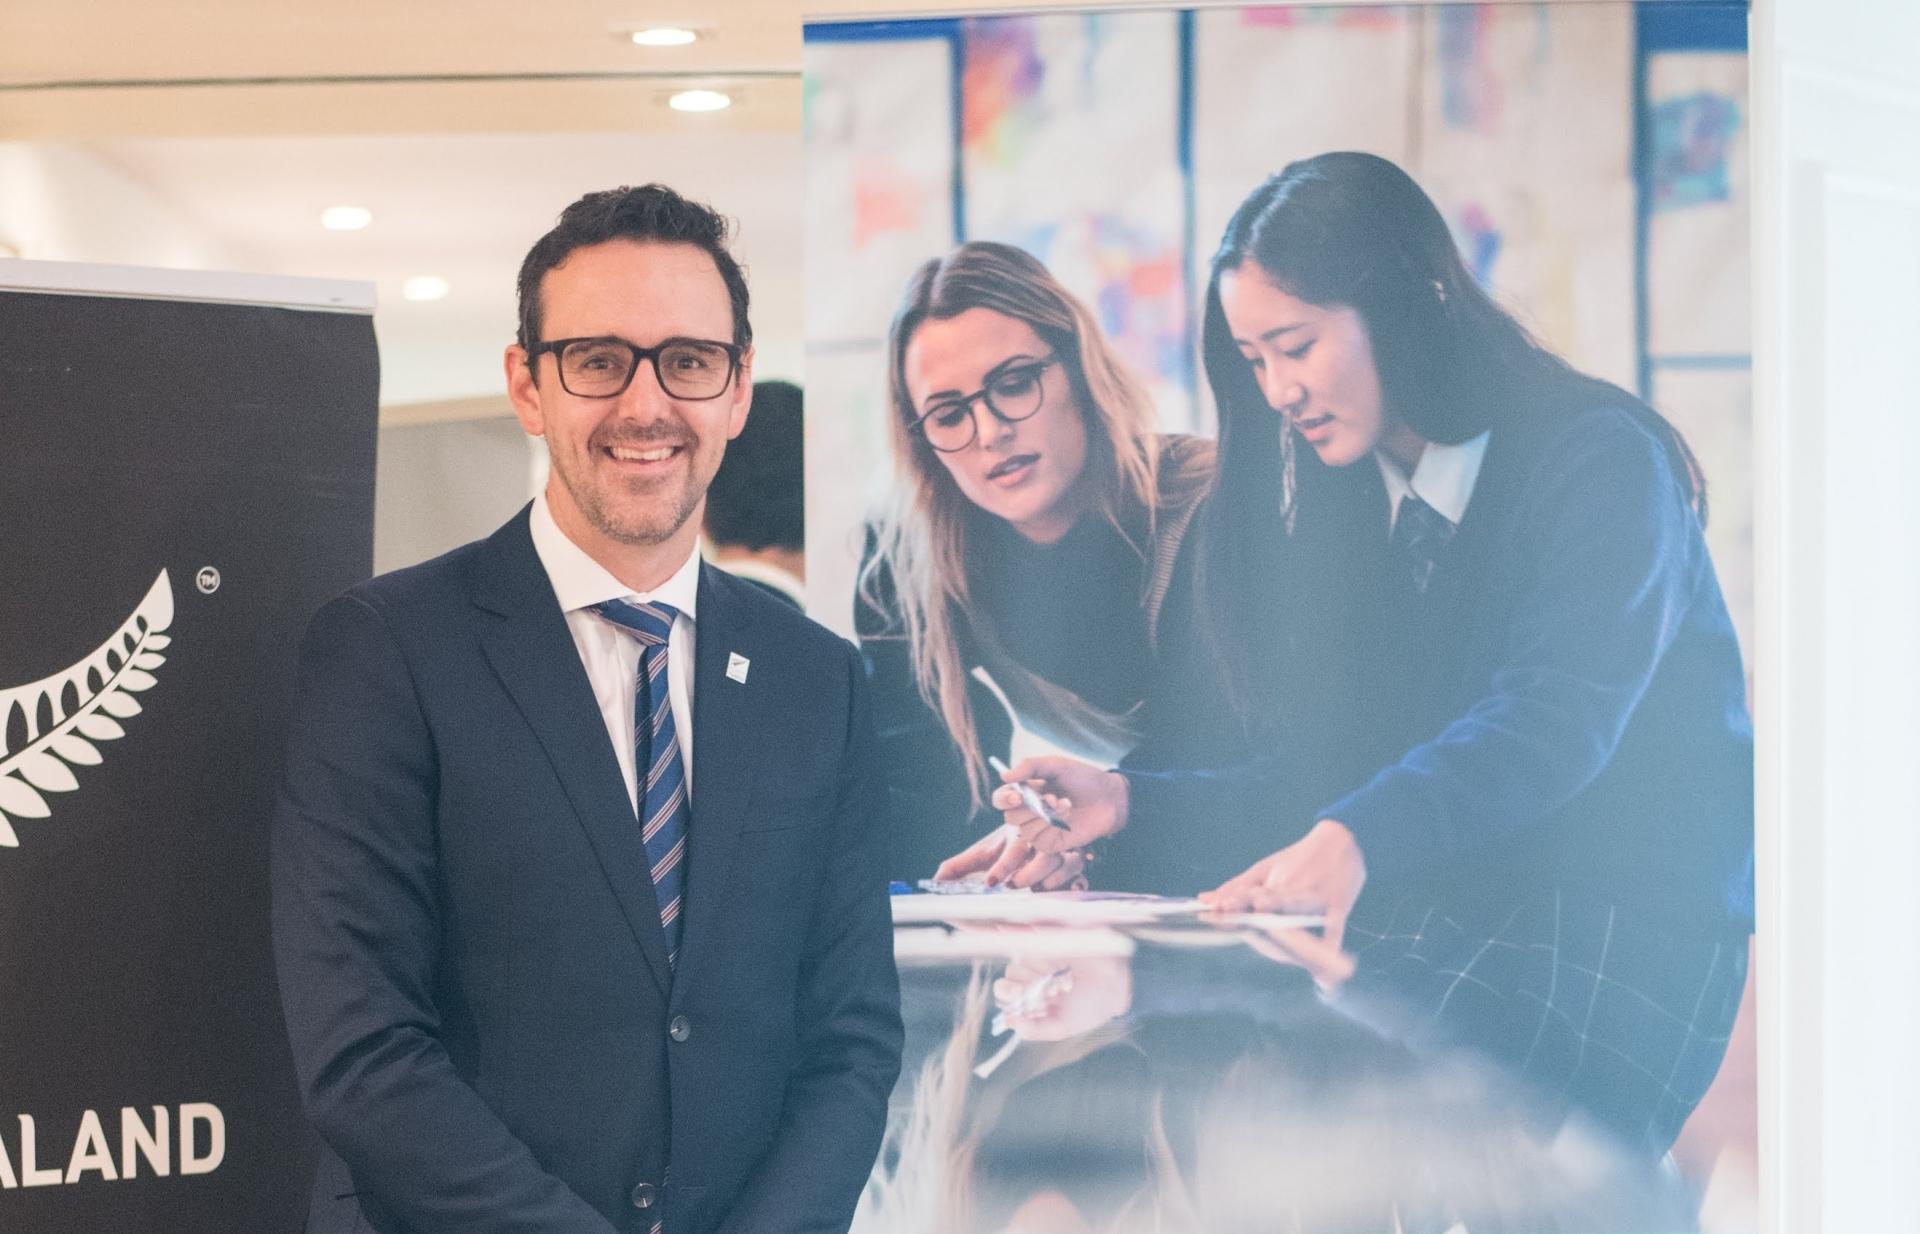 Vietnam and New Zealand renew education partnership amidst robust demand